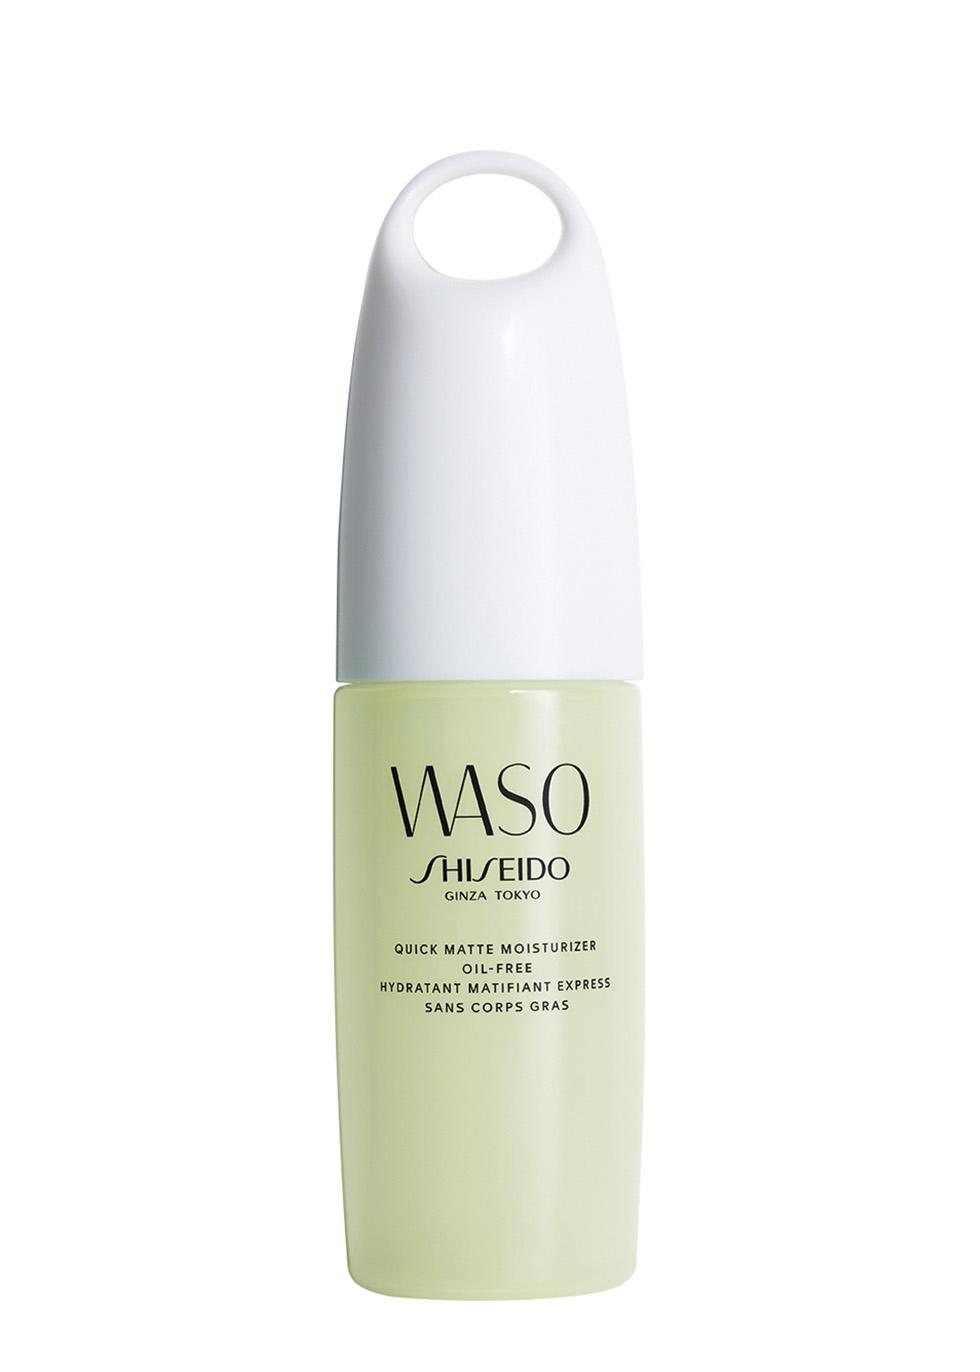 WASO Oil-Free Quick Matte Moisturizer 75ml